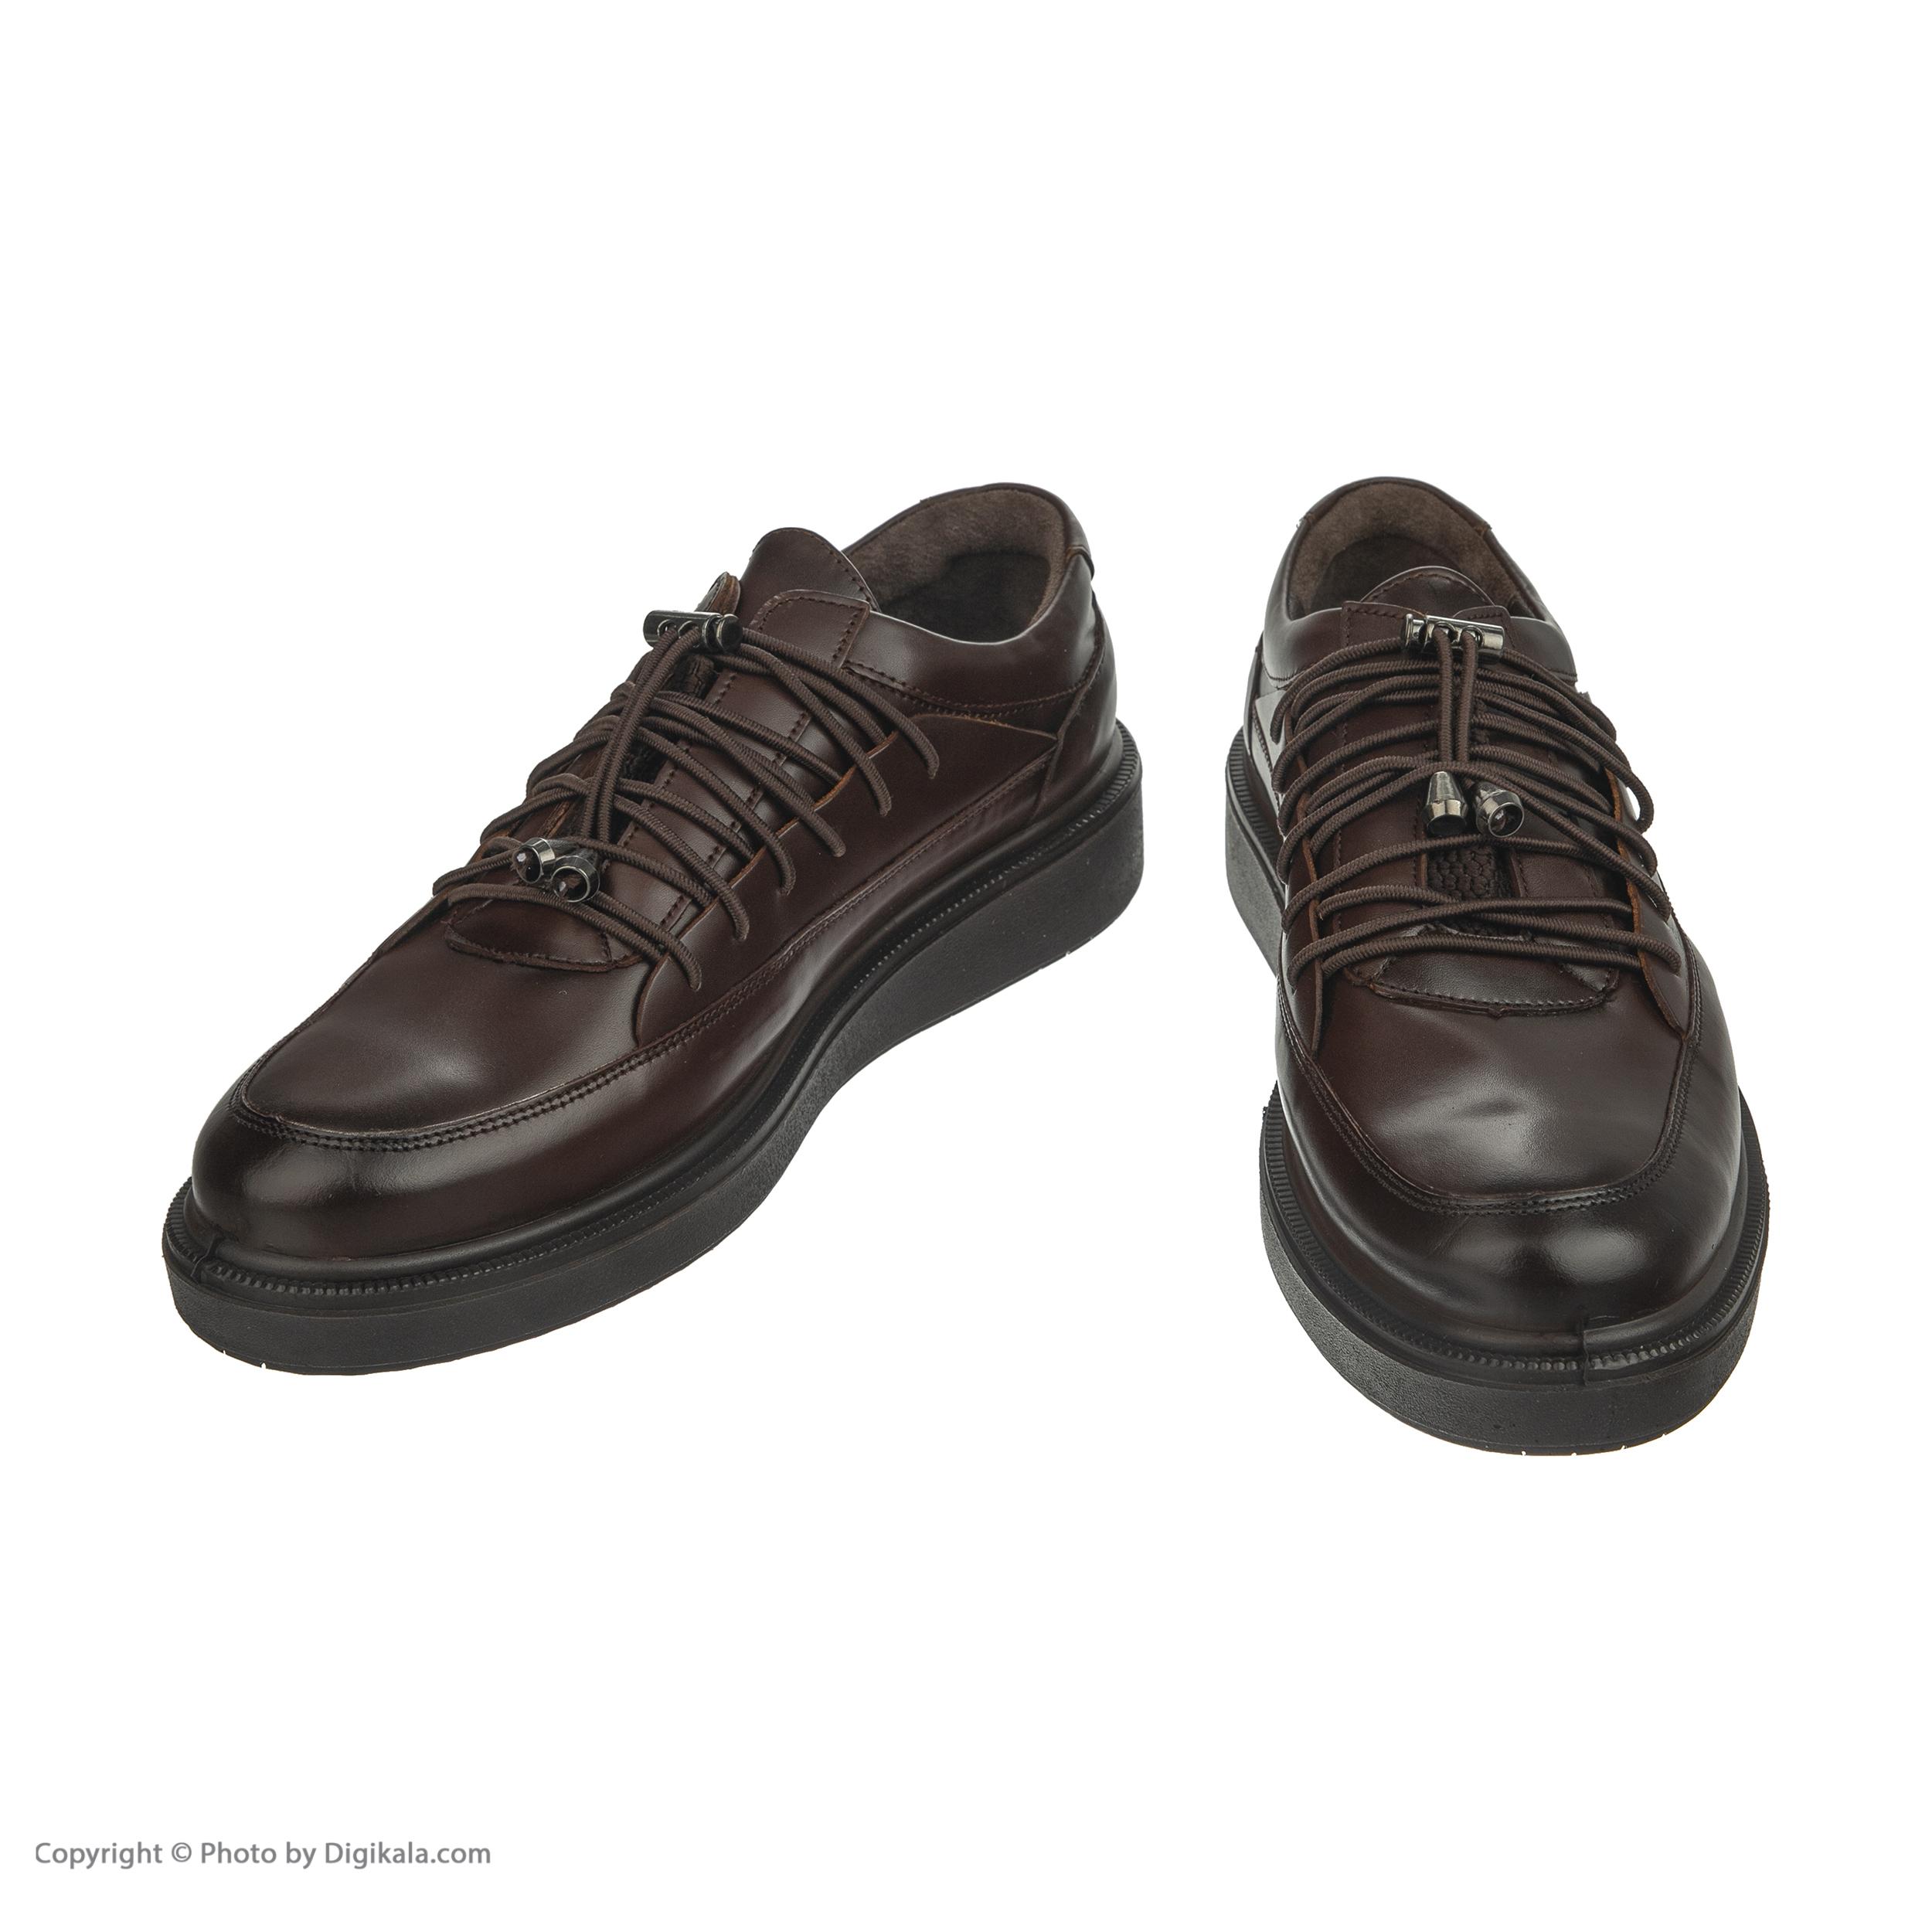 کفش روزمره مردانه آقانژاد مدل 10011-39